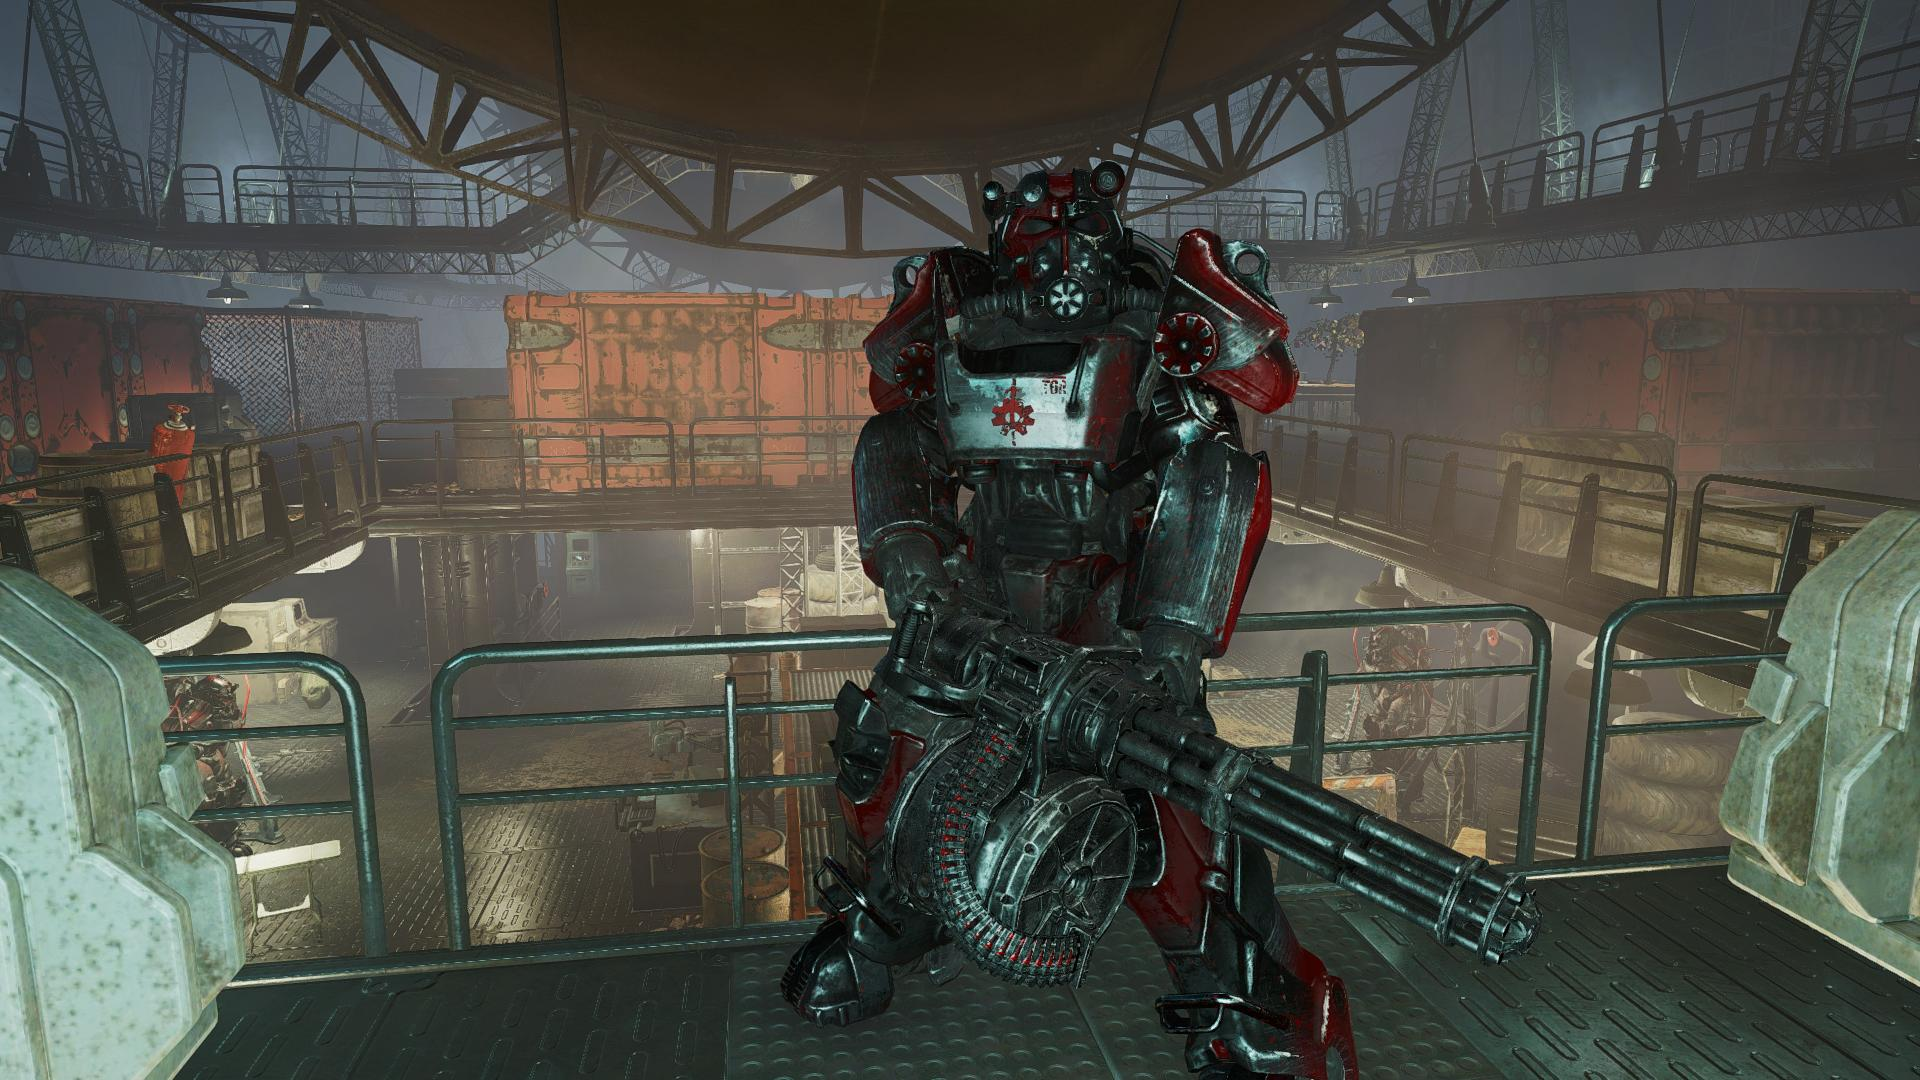 000542.Jpg - Fallout 4